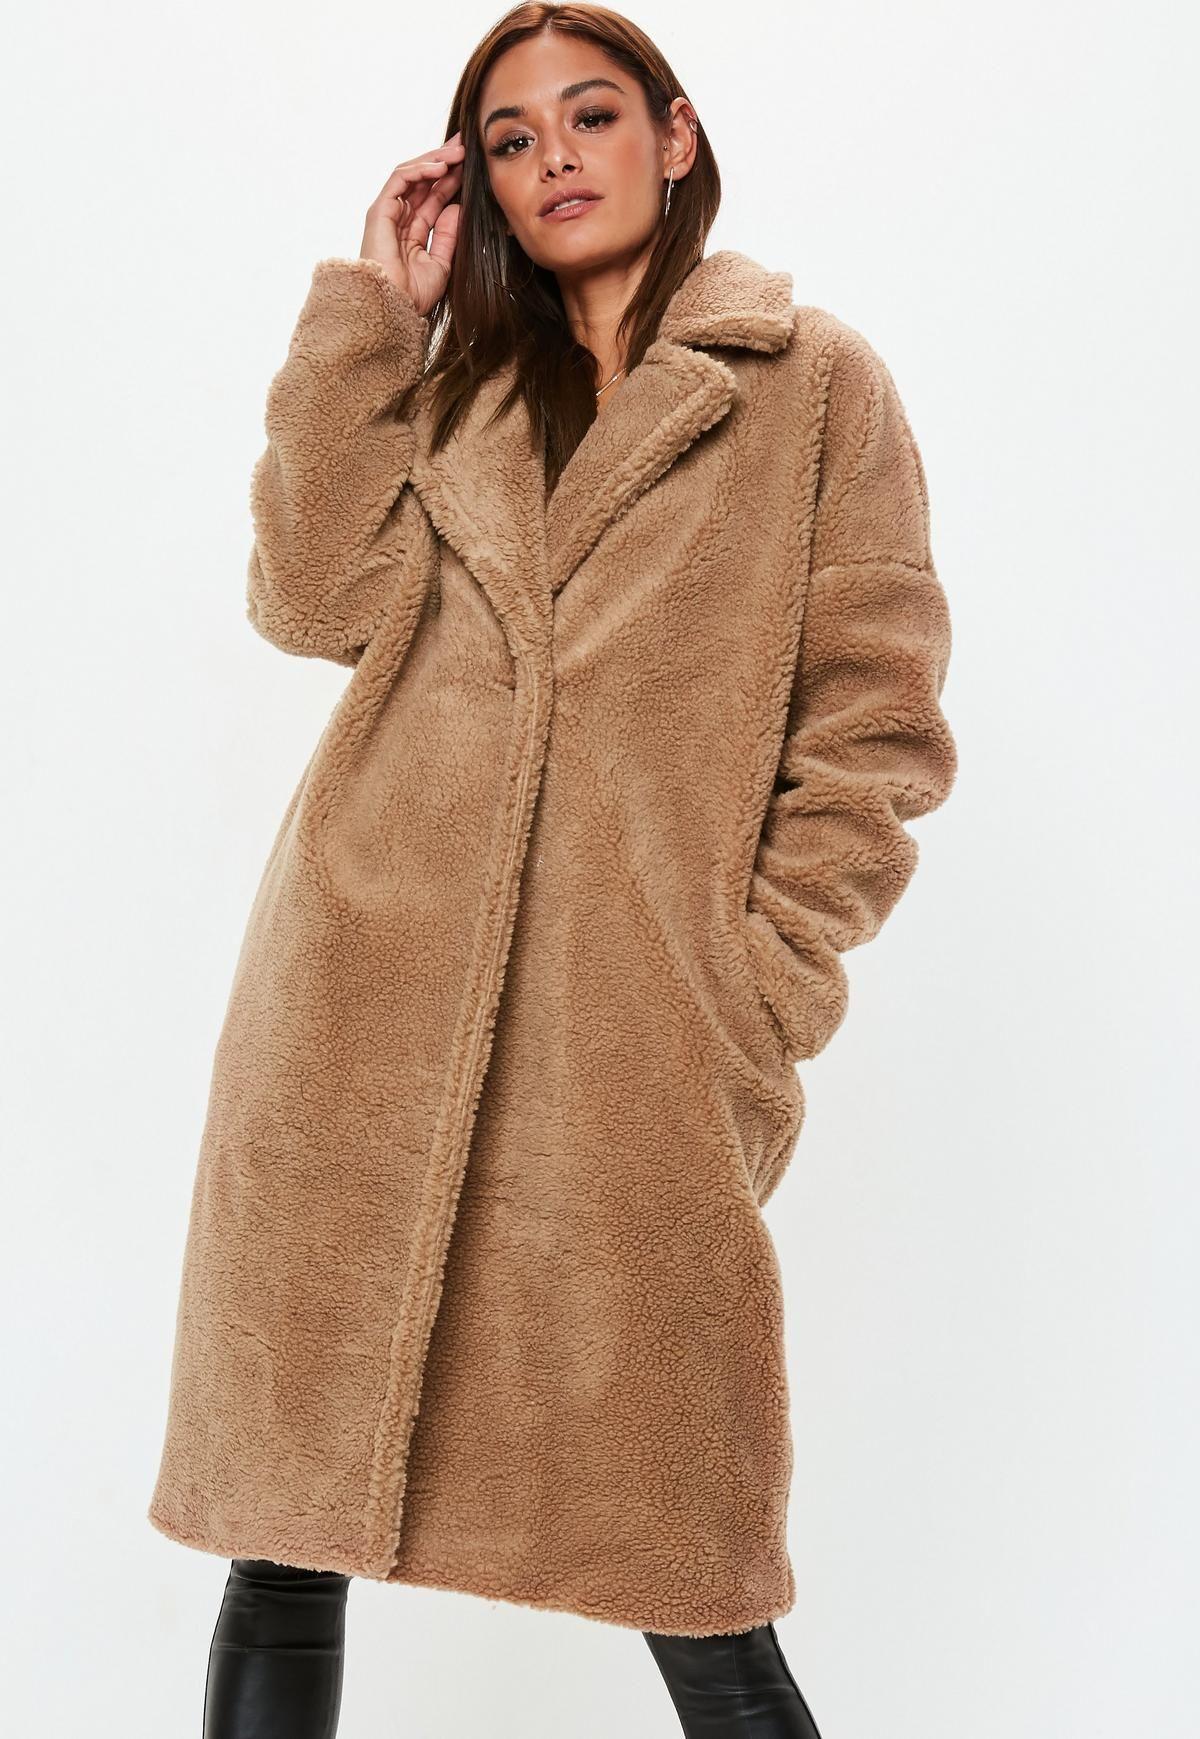 Caramel Oversized Chunky Borg Teddy Coat Missguided Coats For Women Coats Jackets Women Petite Outfits [ 1739 x 1200 Pixel ]